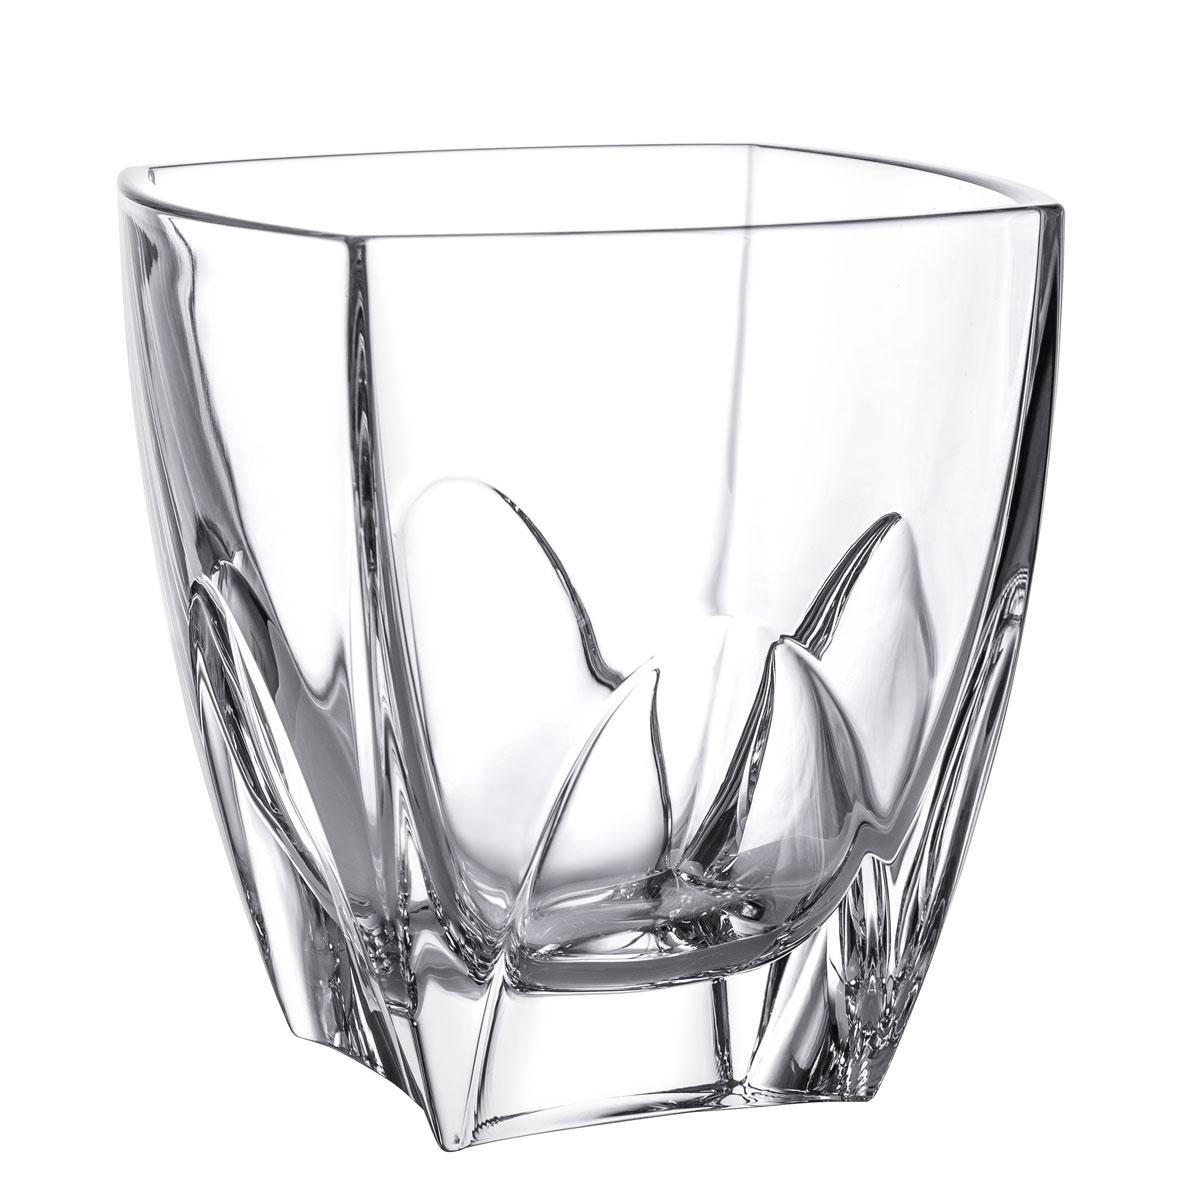 Orrefors Crystal, Cathedral Medium Vase